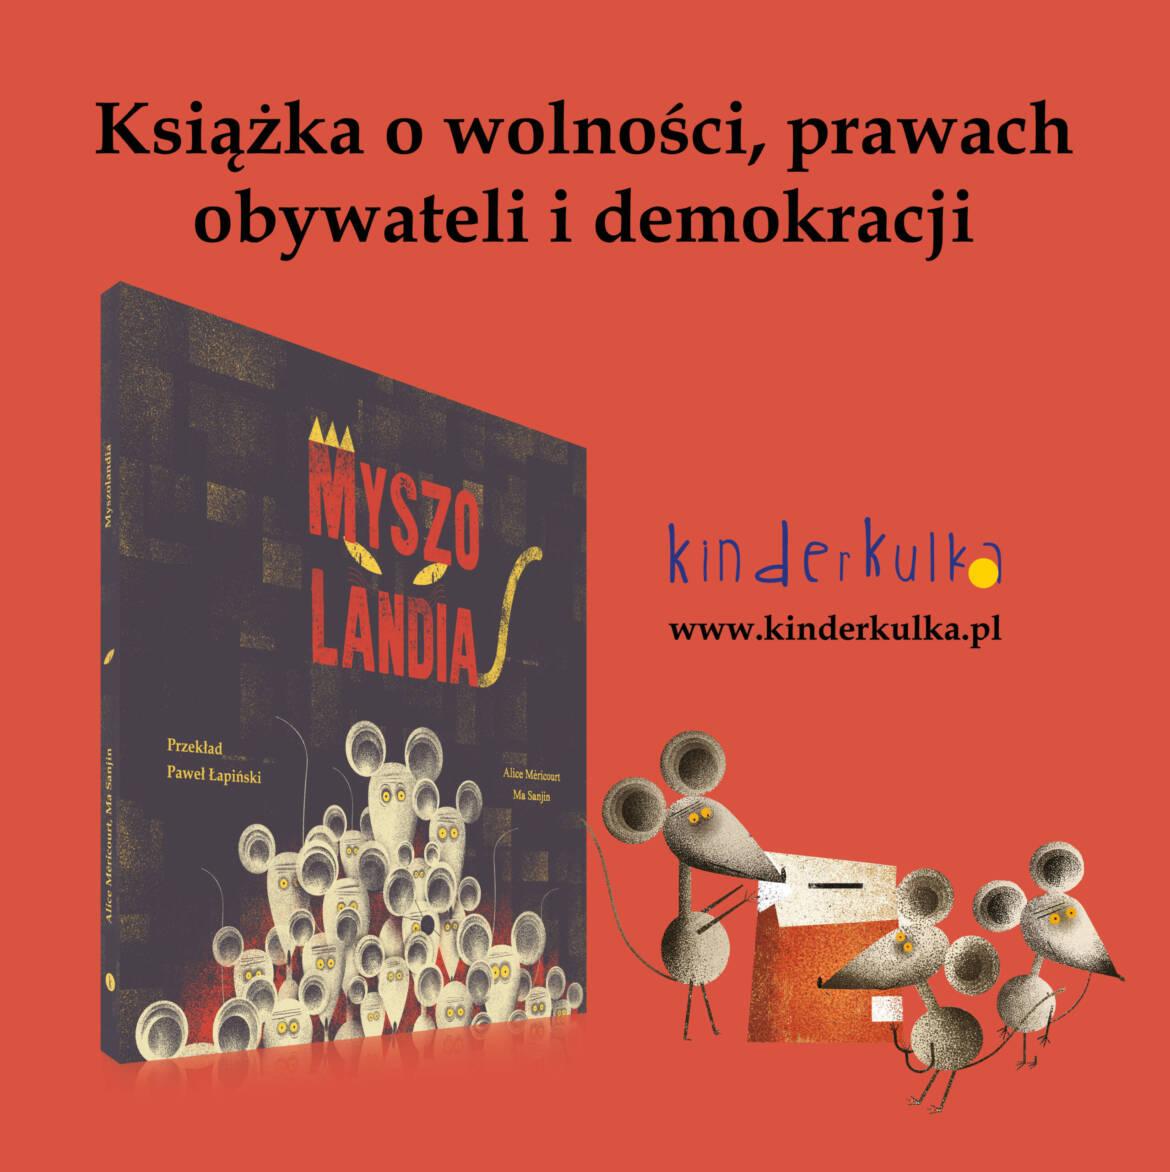 Myszolandia_Kinderkullka-scaled.jpg